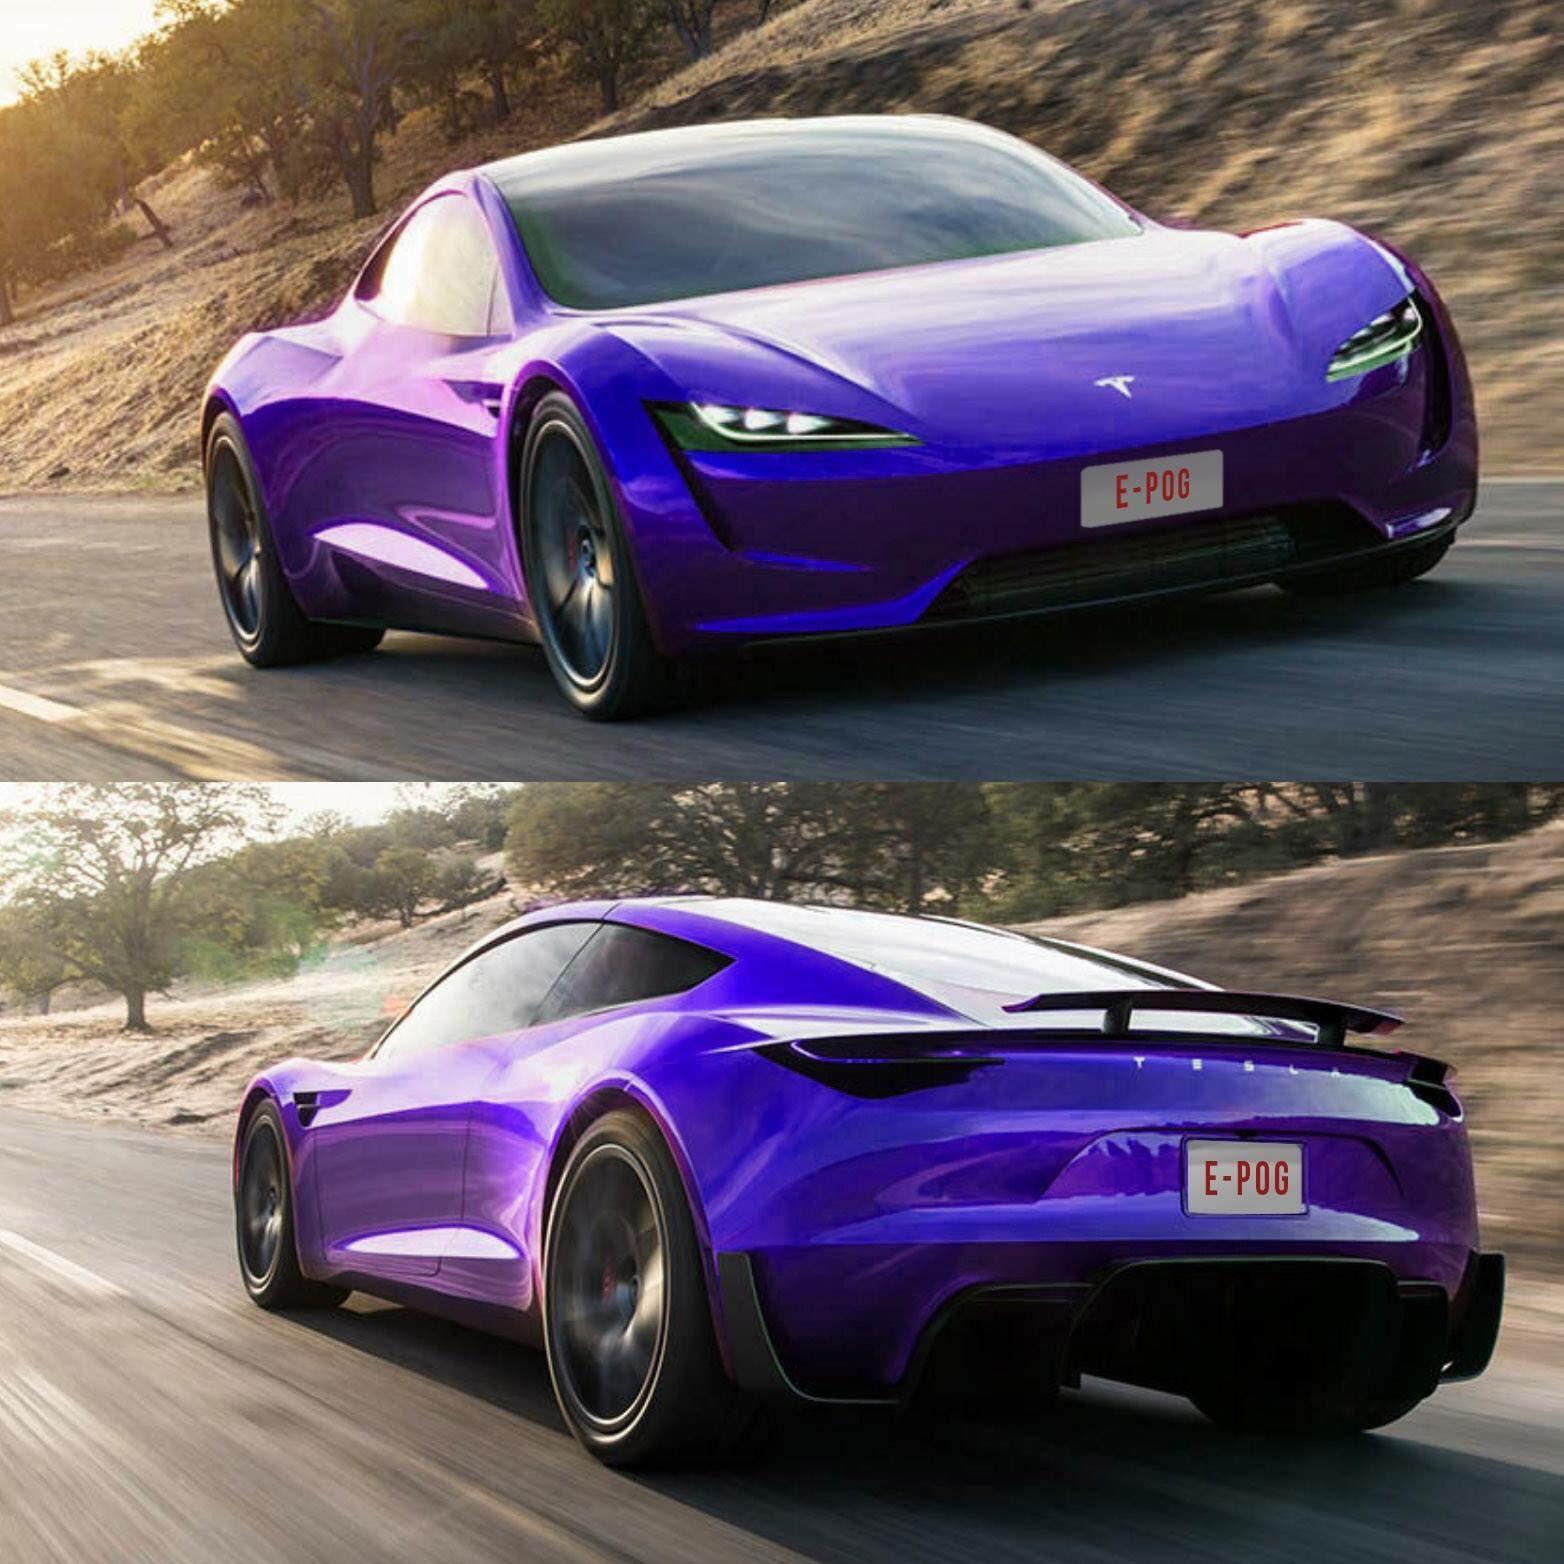 Pin by Chris Borders on Tesla Motors Electric Vehicles